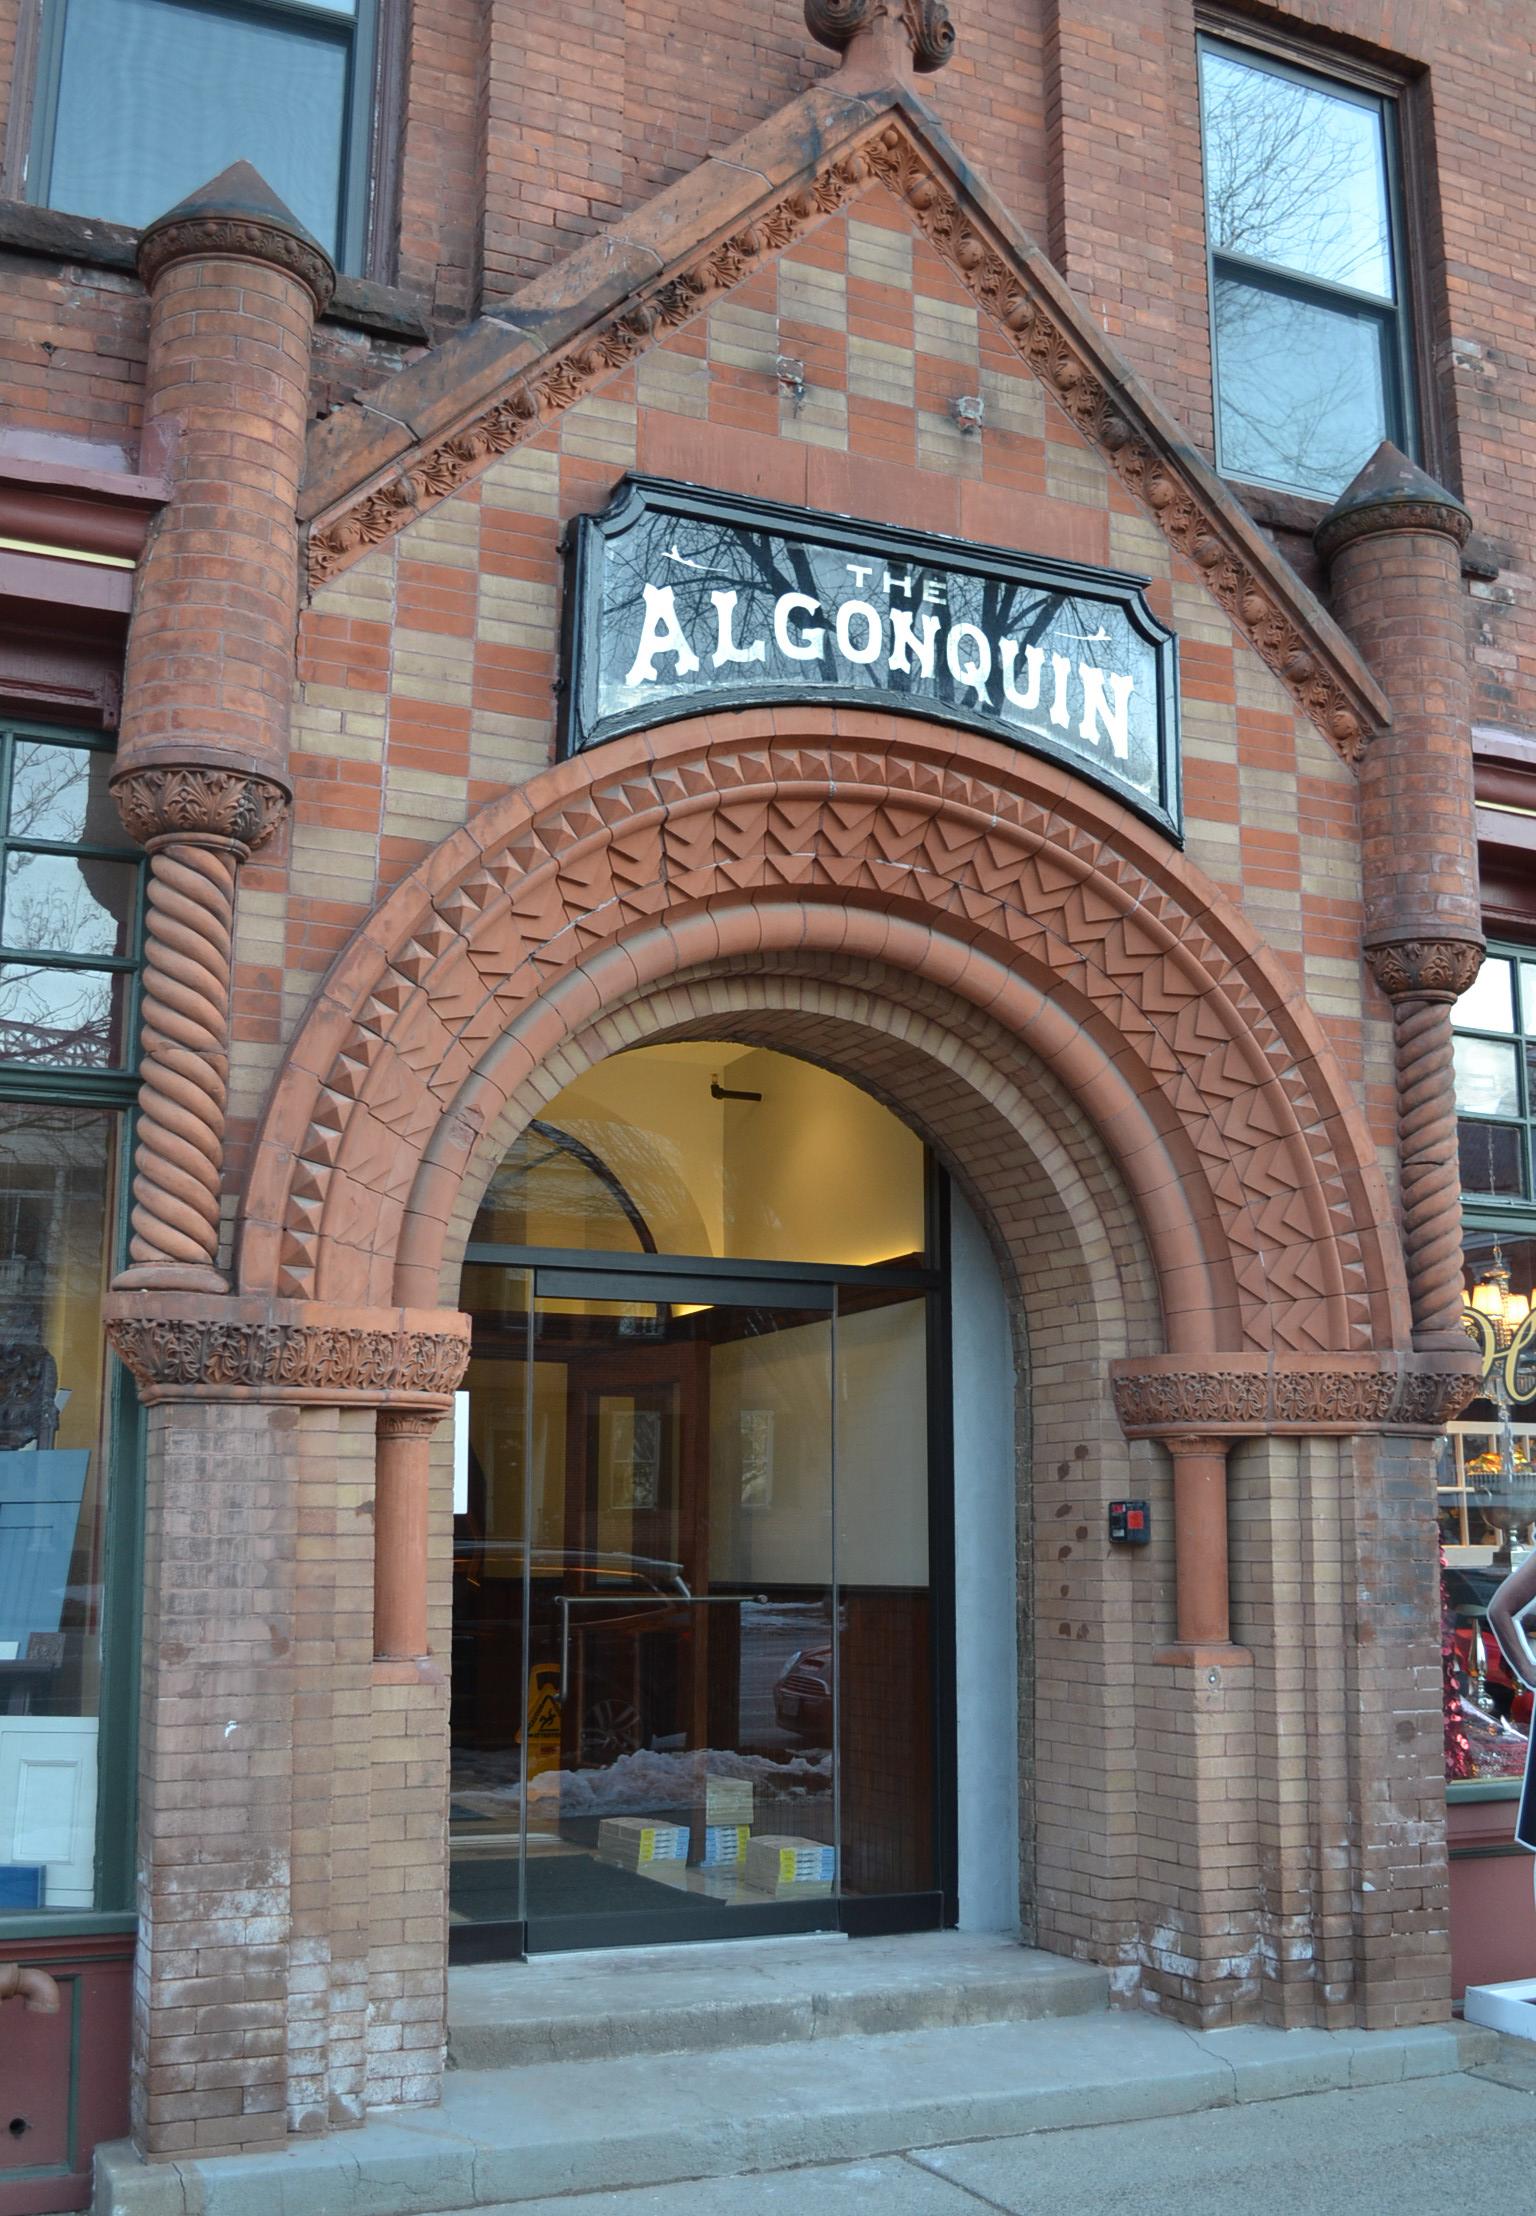 The Algonquin - Saratoga springs, NYHousingClient: Built: 1892Project Costs: $9 millionHTC equity: Over $ million